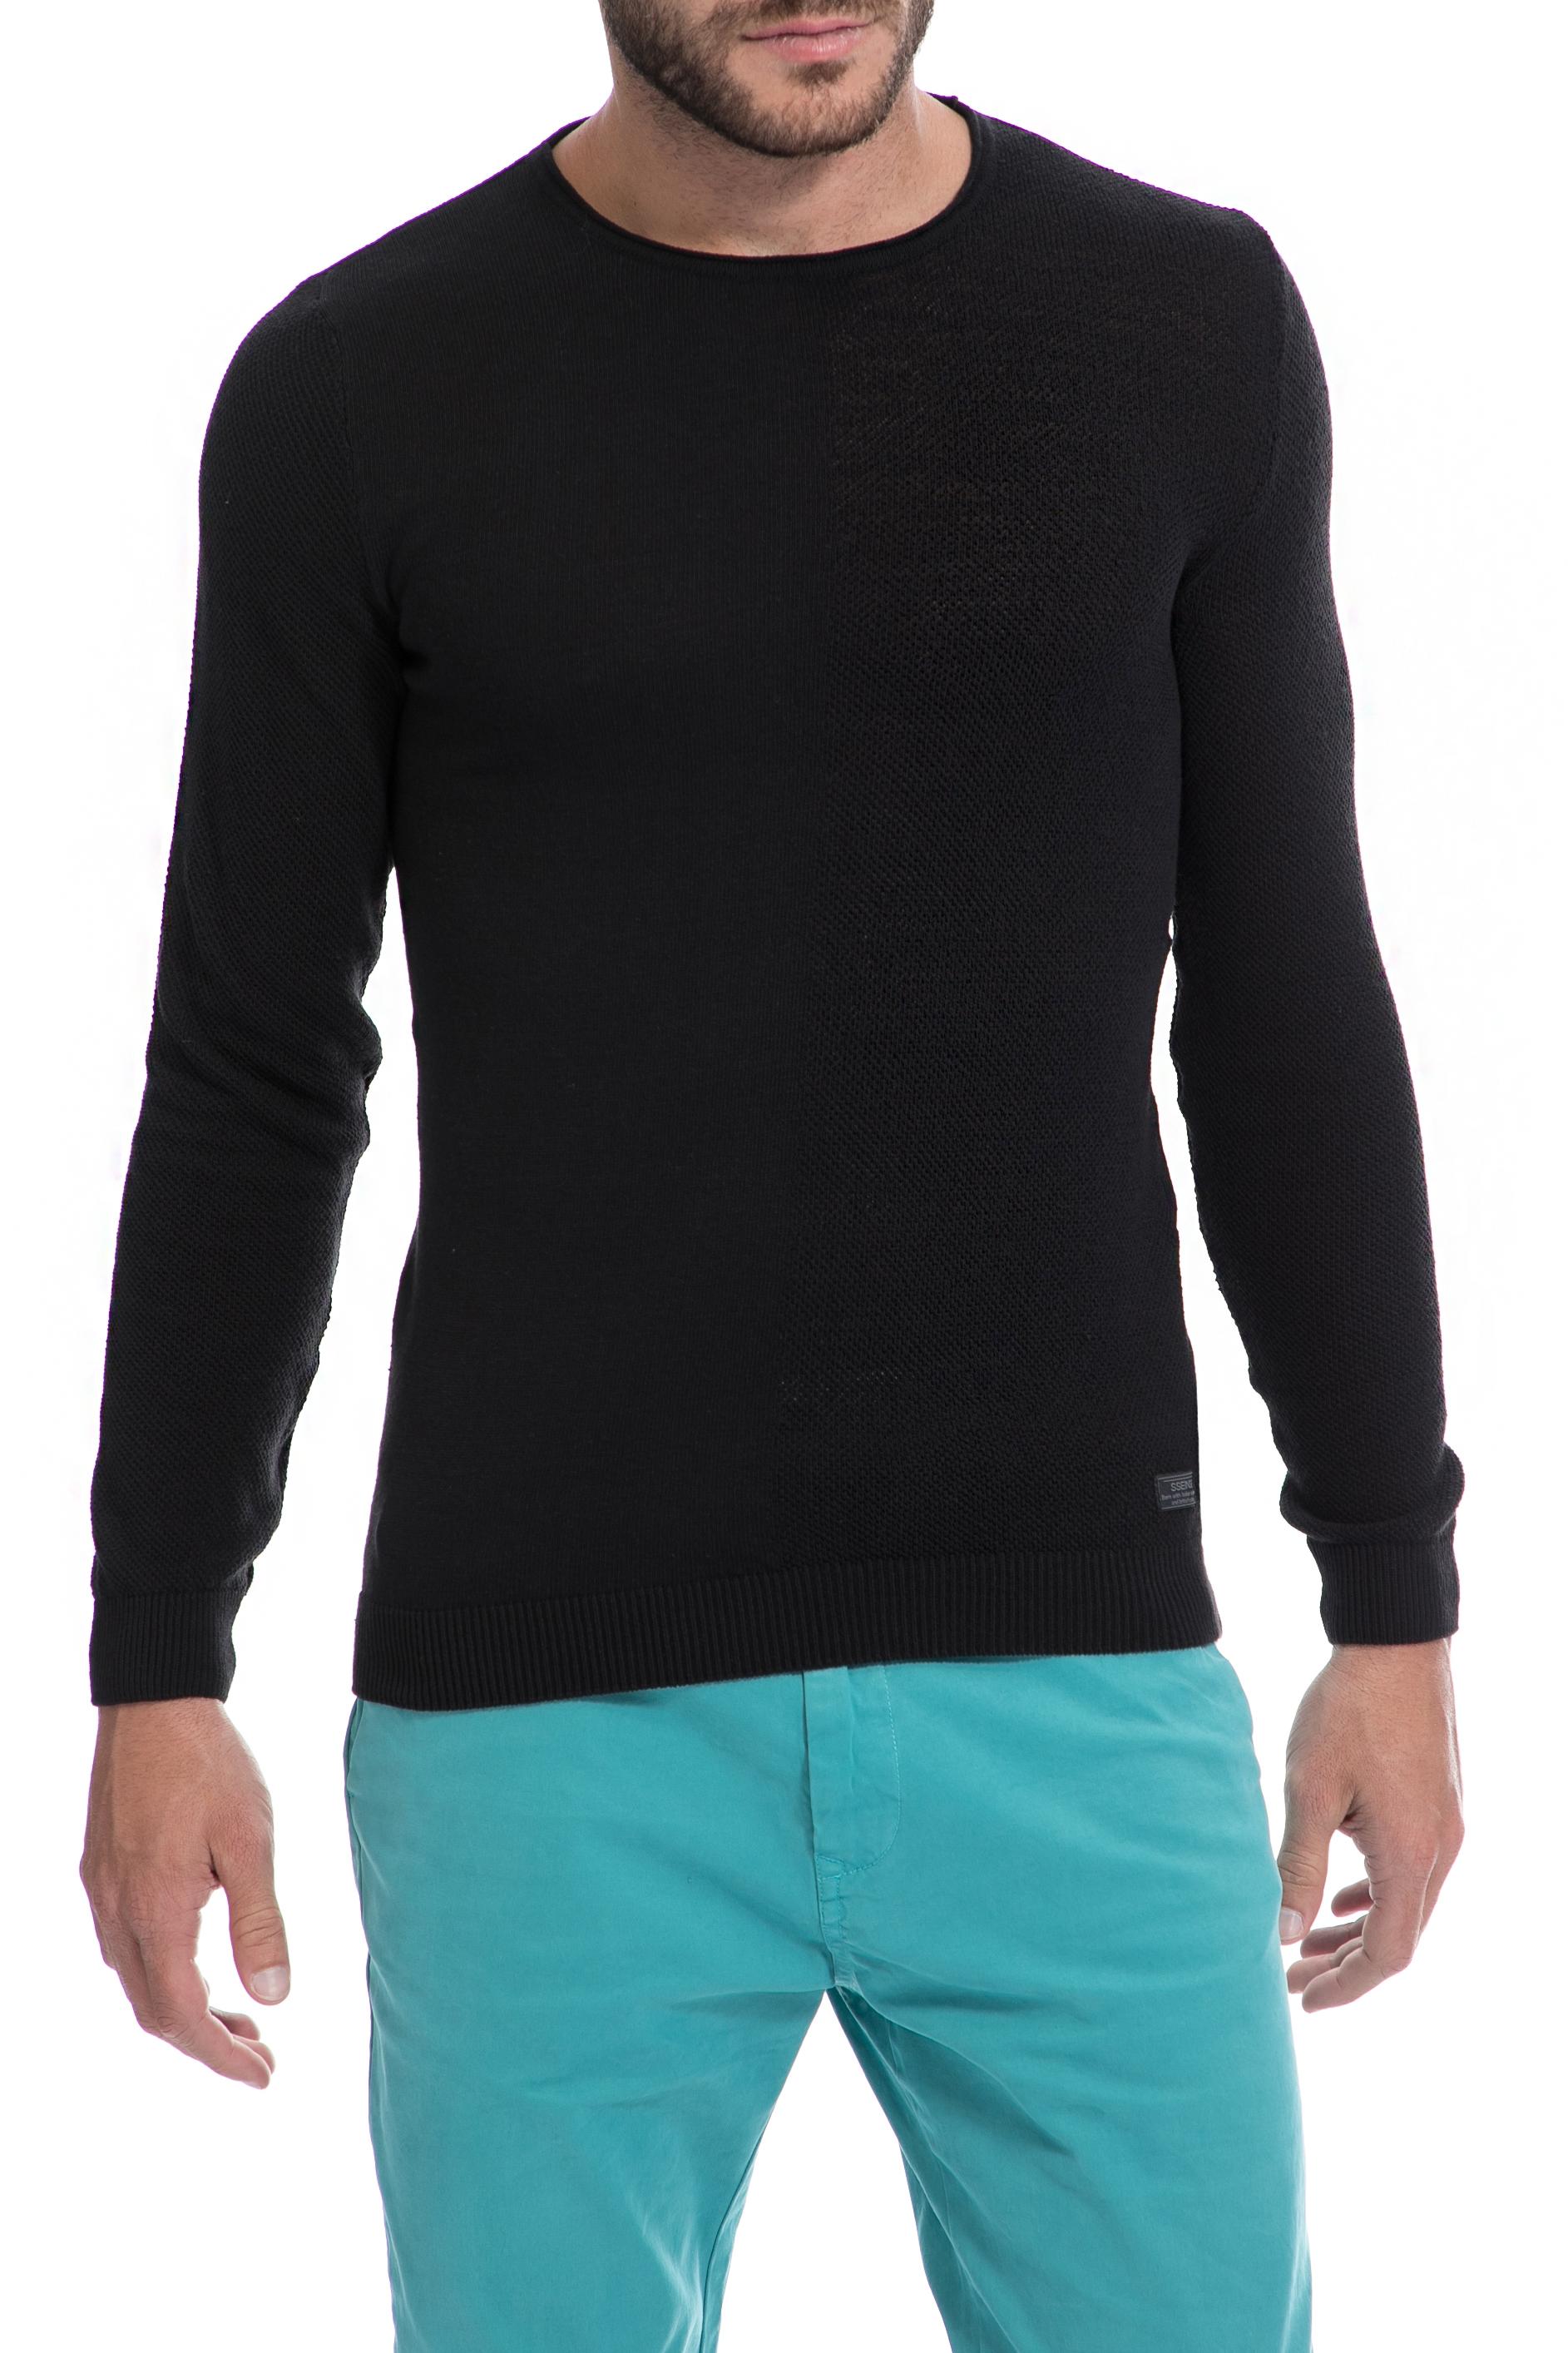 SSEINSE - Ανδρικό πουλόβερ SSEINSE μαύρο ανδρικά ρούχα πλεκτά ζακέτες μπλούζες